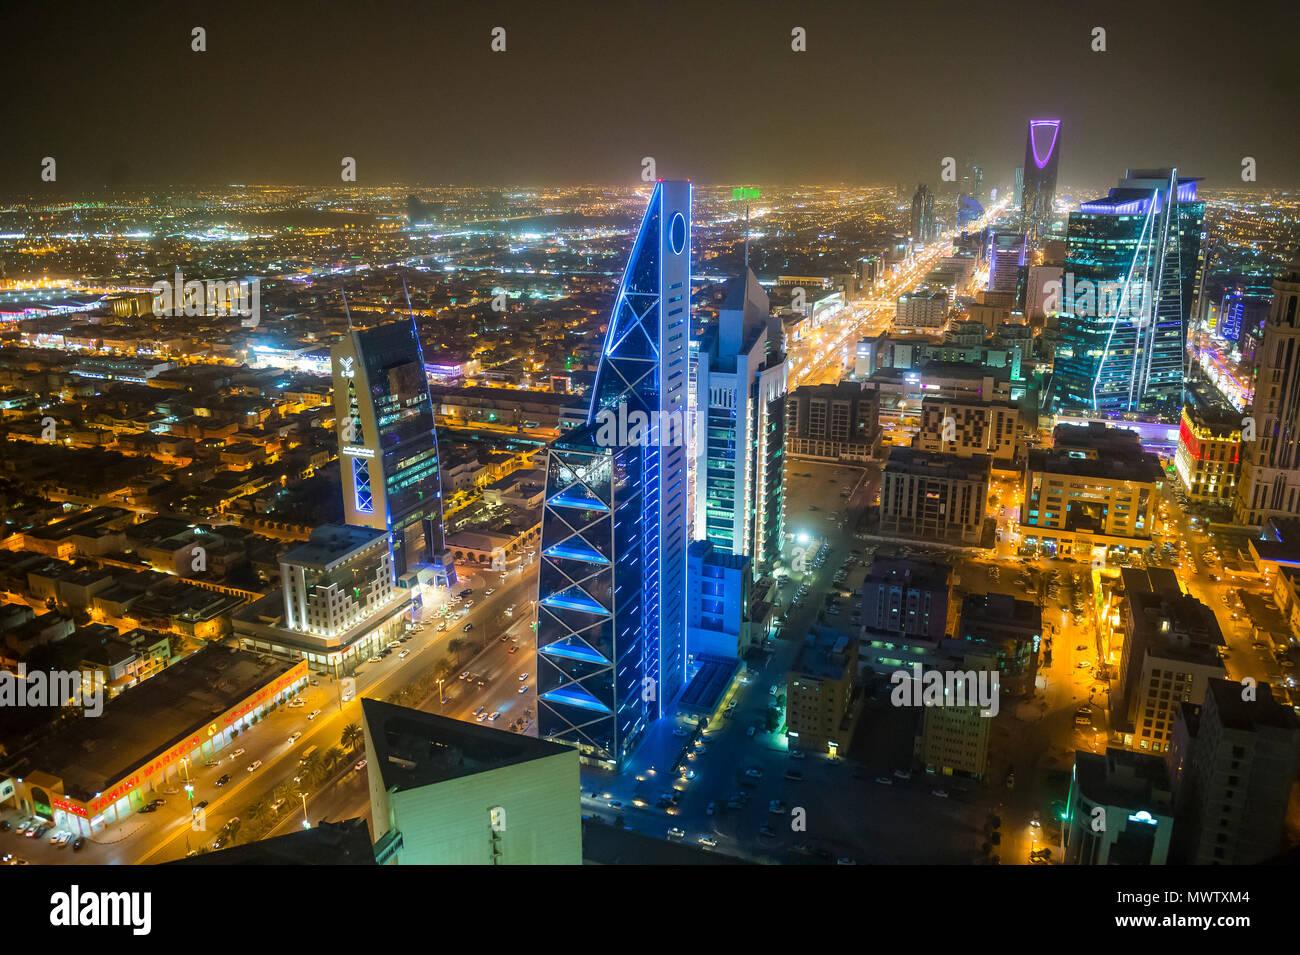 View over Riyadh from the Al Faisaliyah Centre skyscraper, Riyadh, Saudi Arabia, Middle East - Stock Image